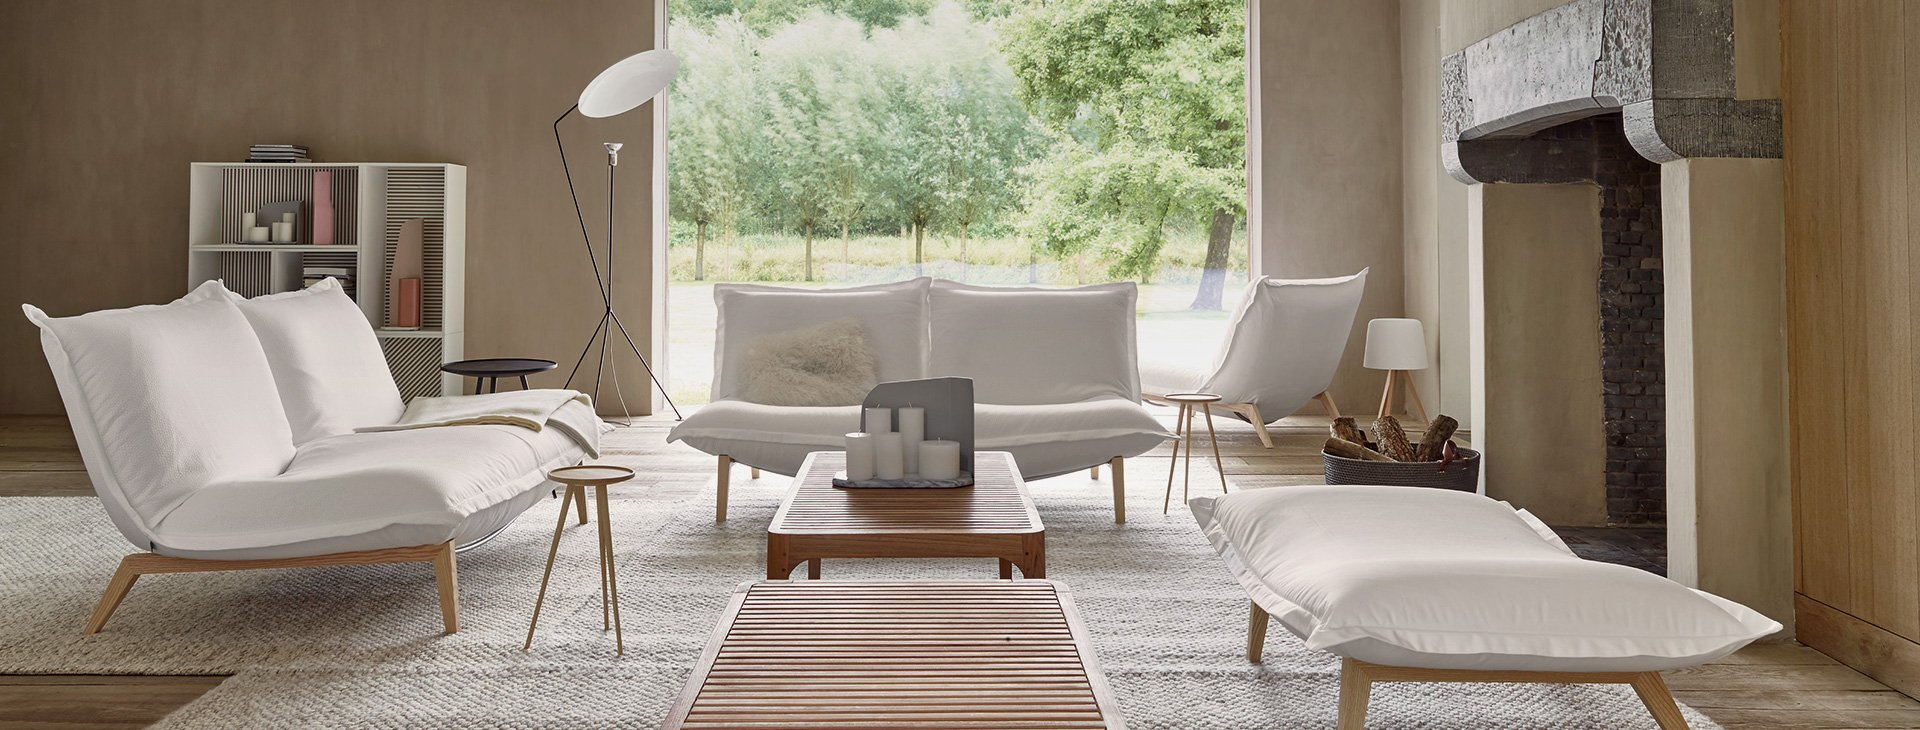 ligne roset ihre stores im stilwerk d sseldorf. Black Bedroom Furniture Sets. Home Design Ideas